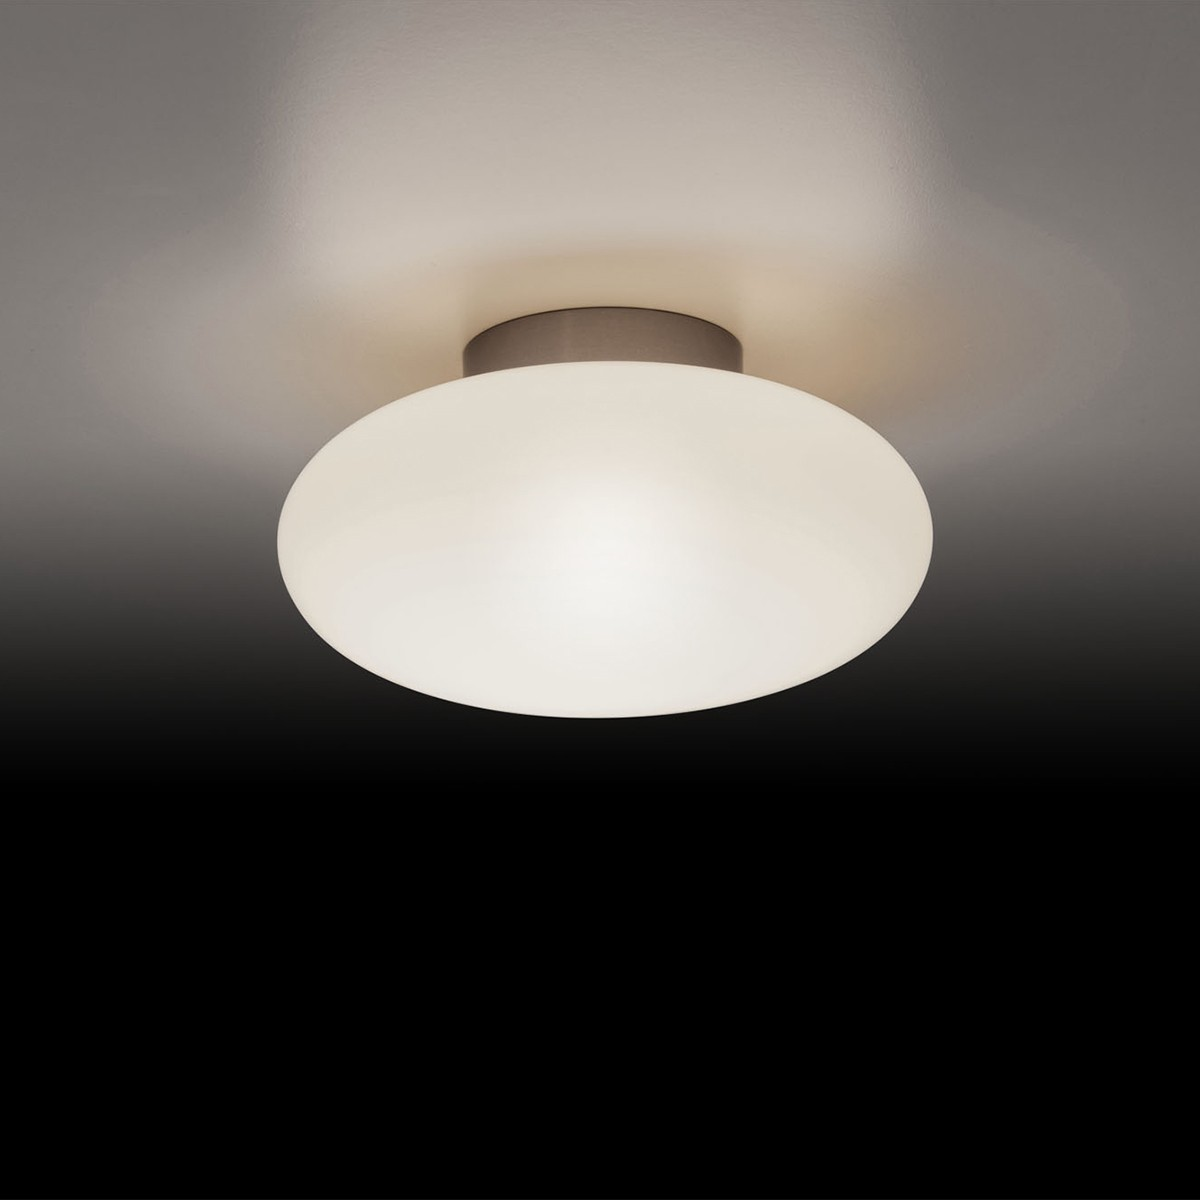 Holtkötter Leuchten Amor D Deckenleuchte LED, Nickel matt, Ø: 19 cm